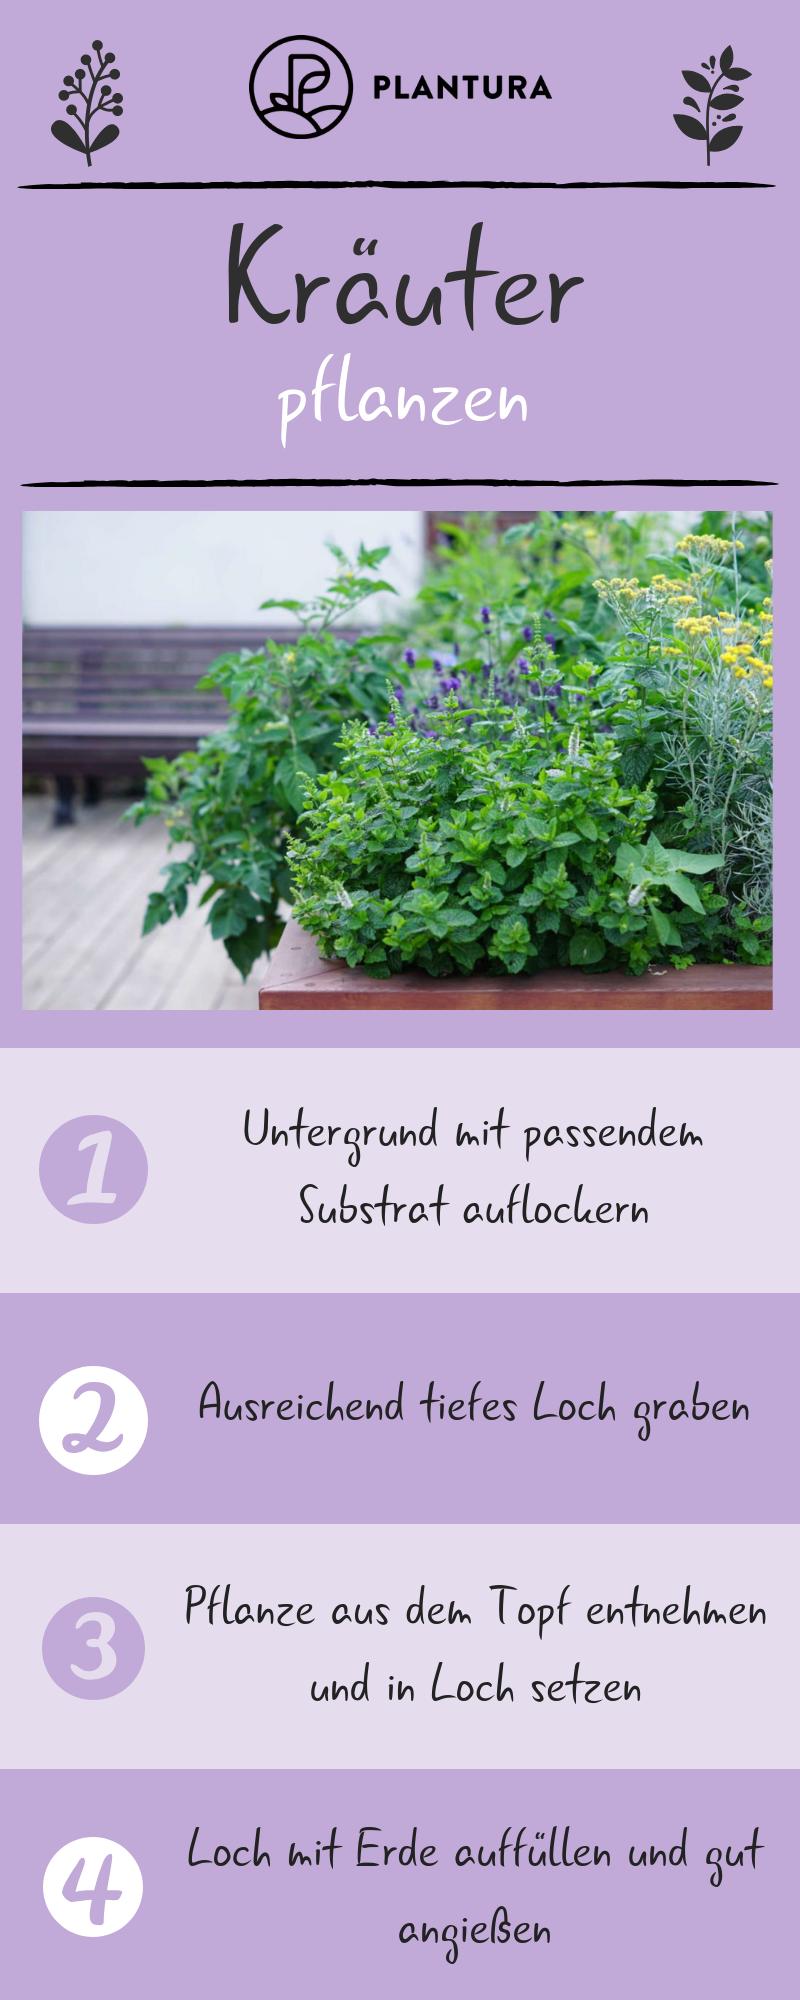 Kräuter Pflanzen Anleitungen Tipps Für Fensterbrett Balkon